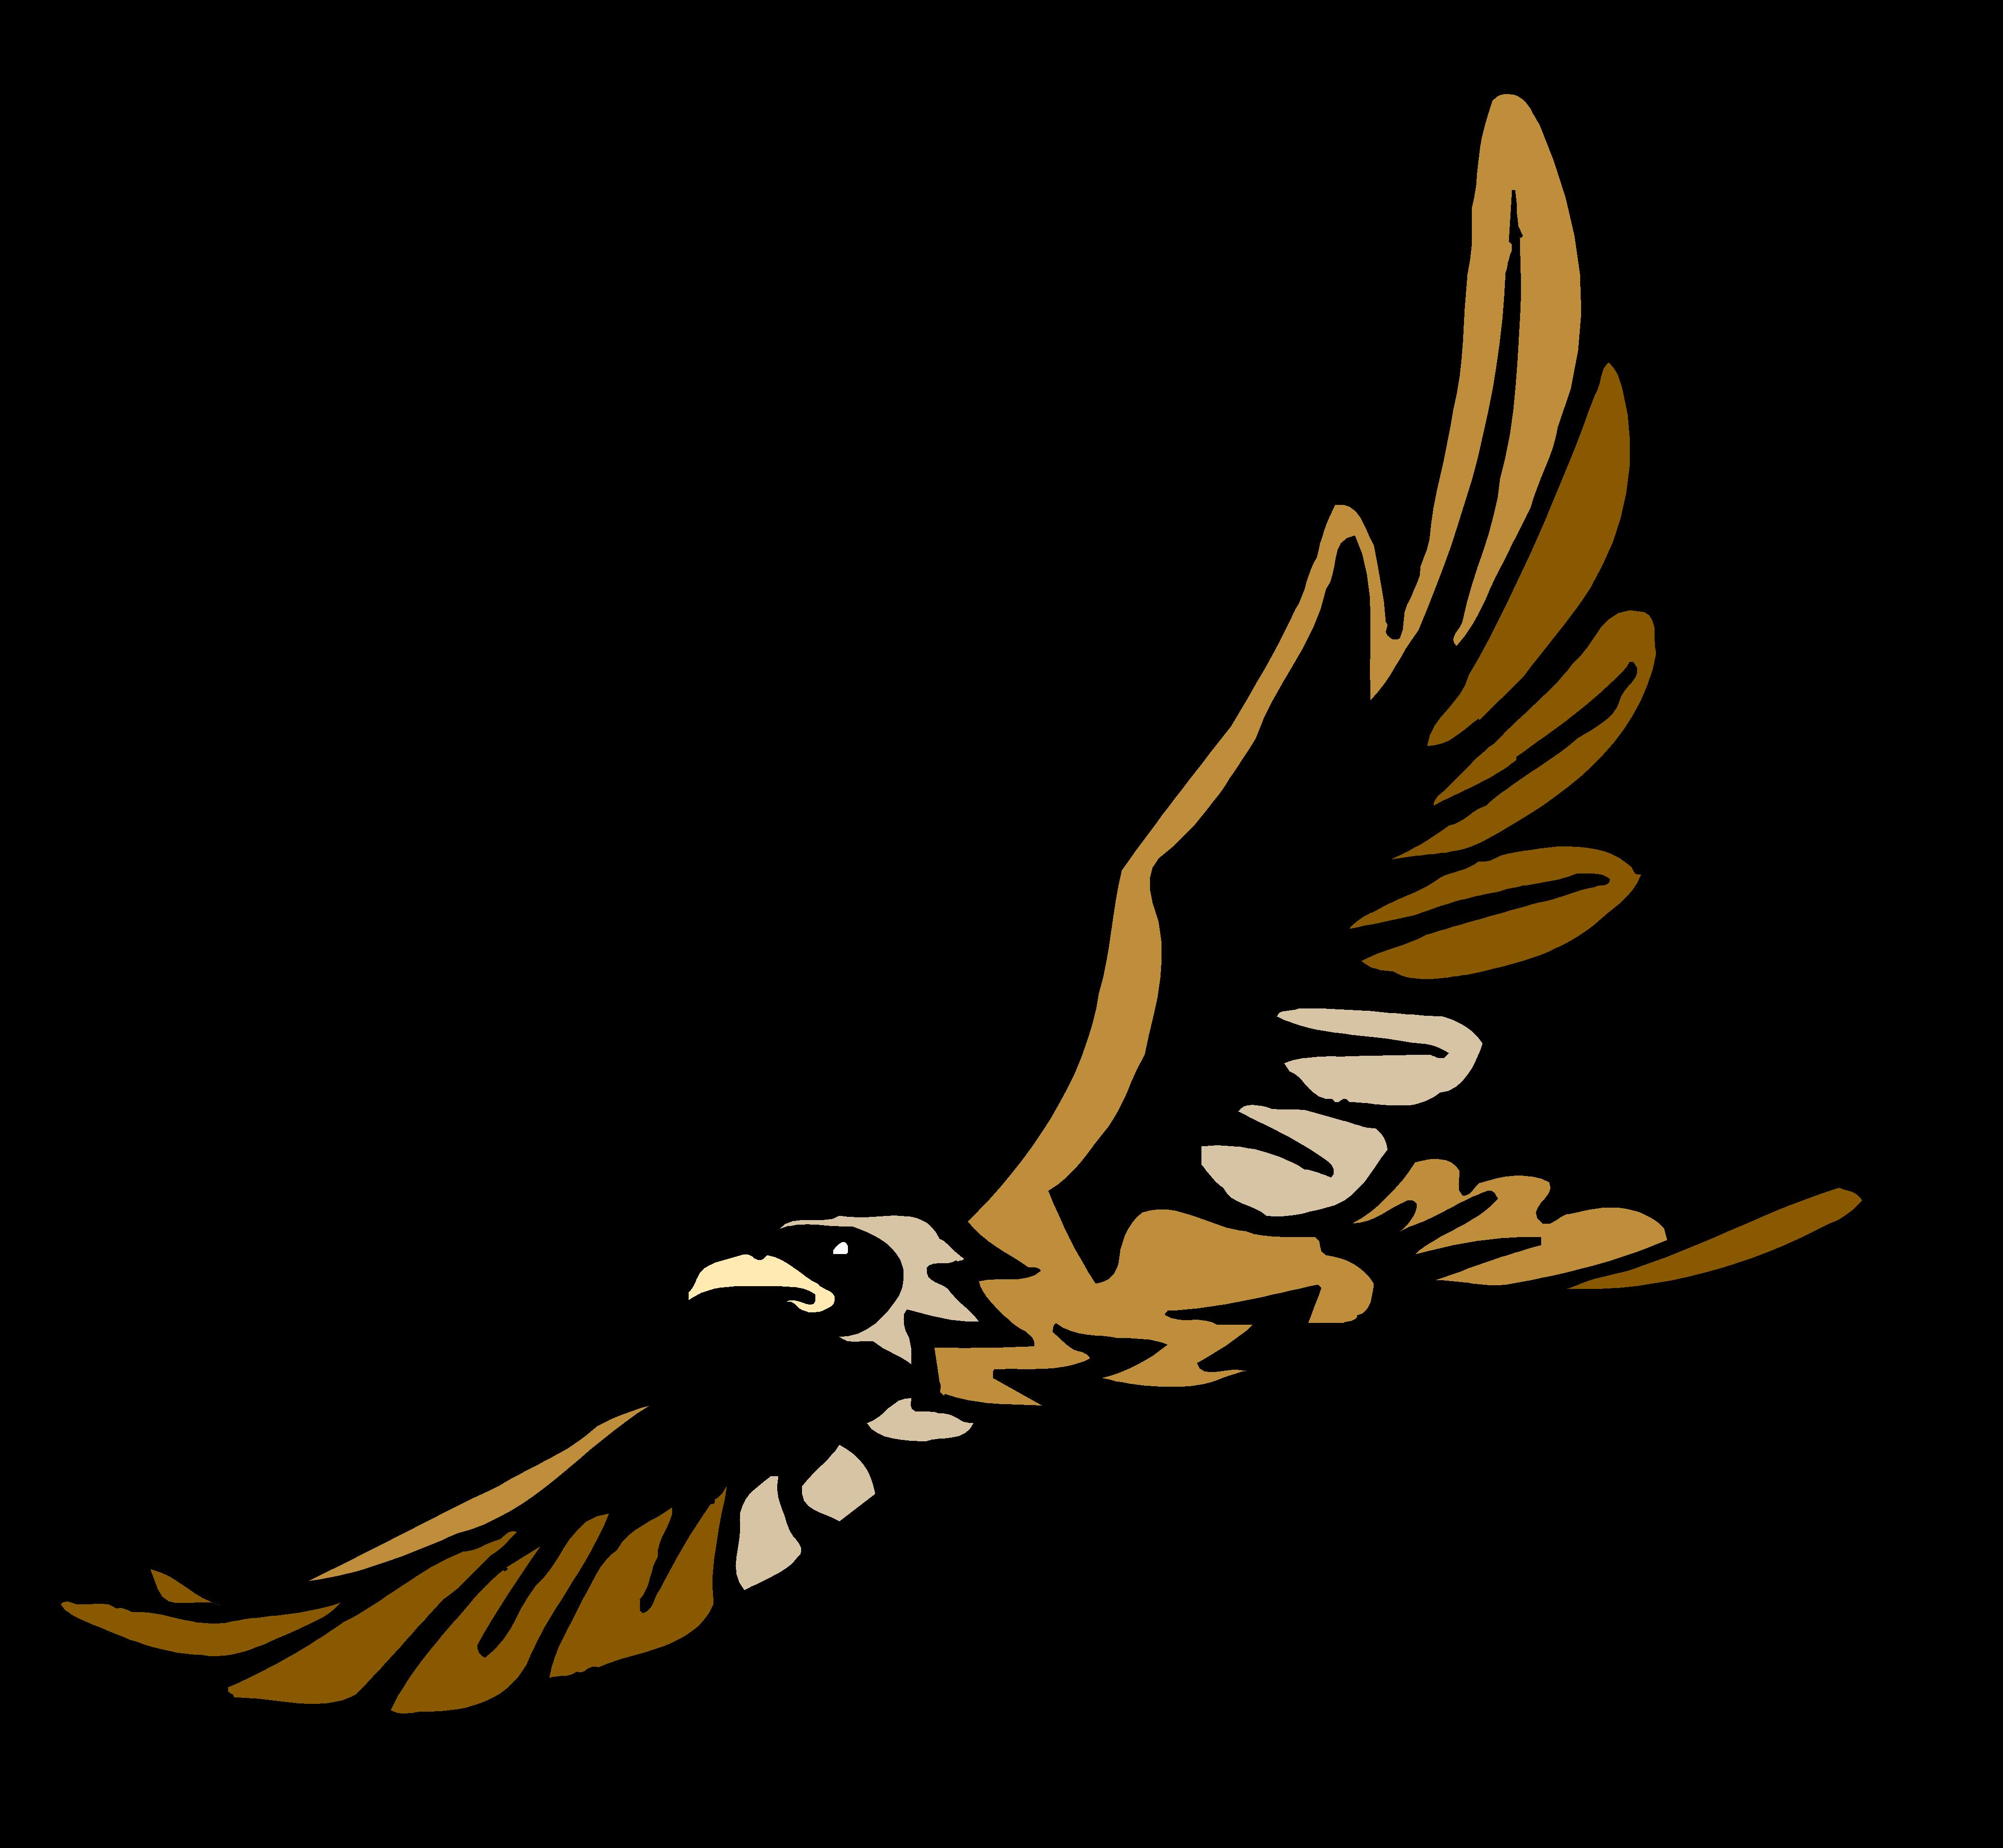 Falcon clipart hawk harris. Tertiary consumer free on